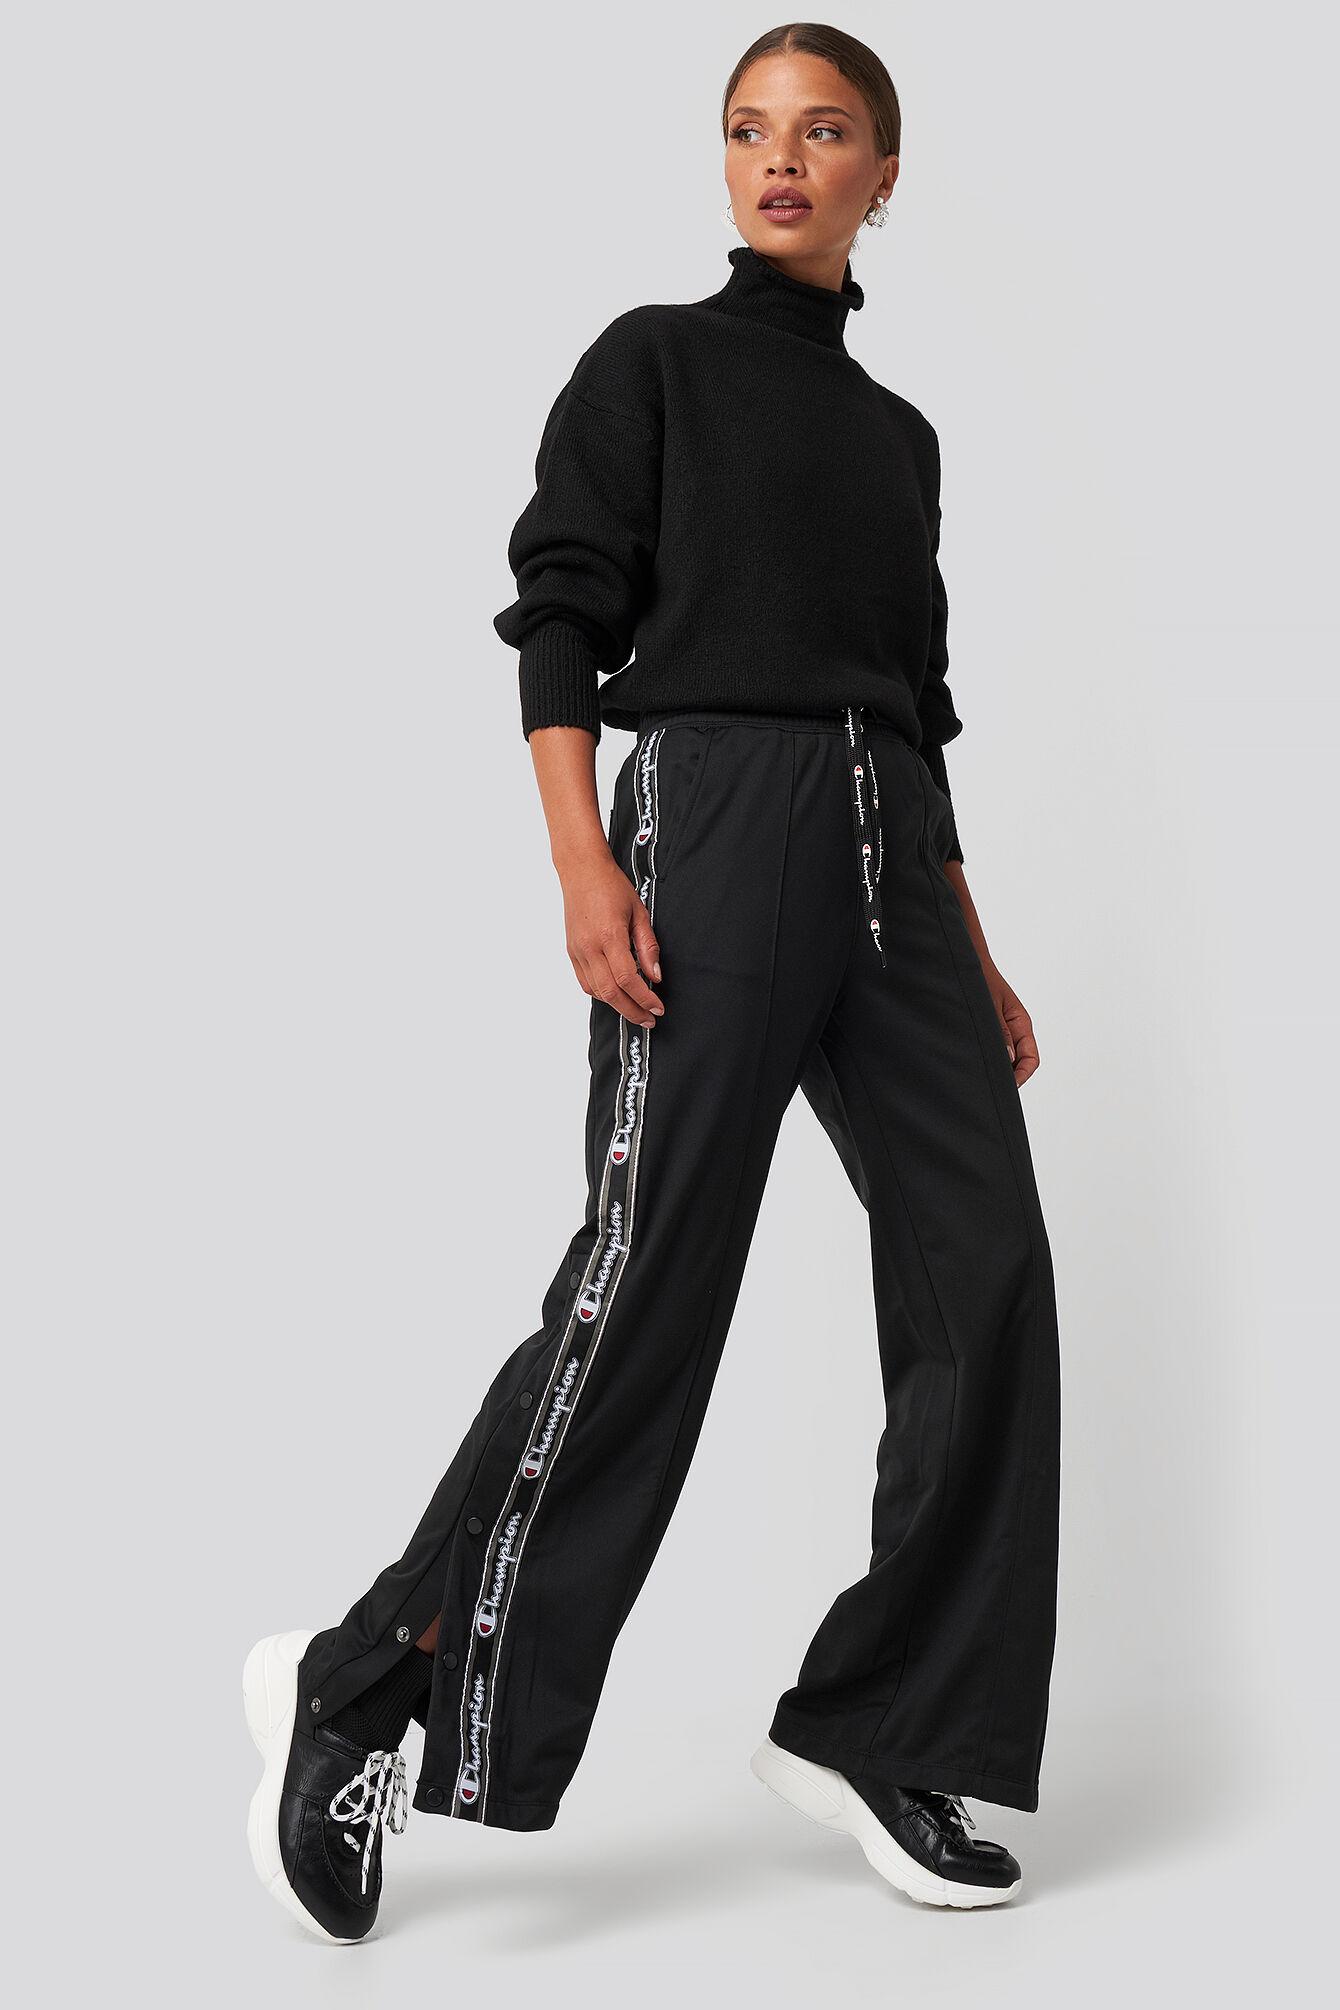 Champion Pants 111976 - Black  - Size: Small